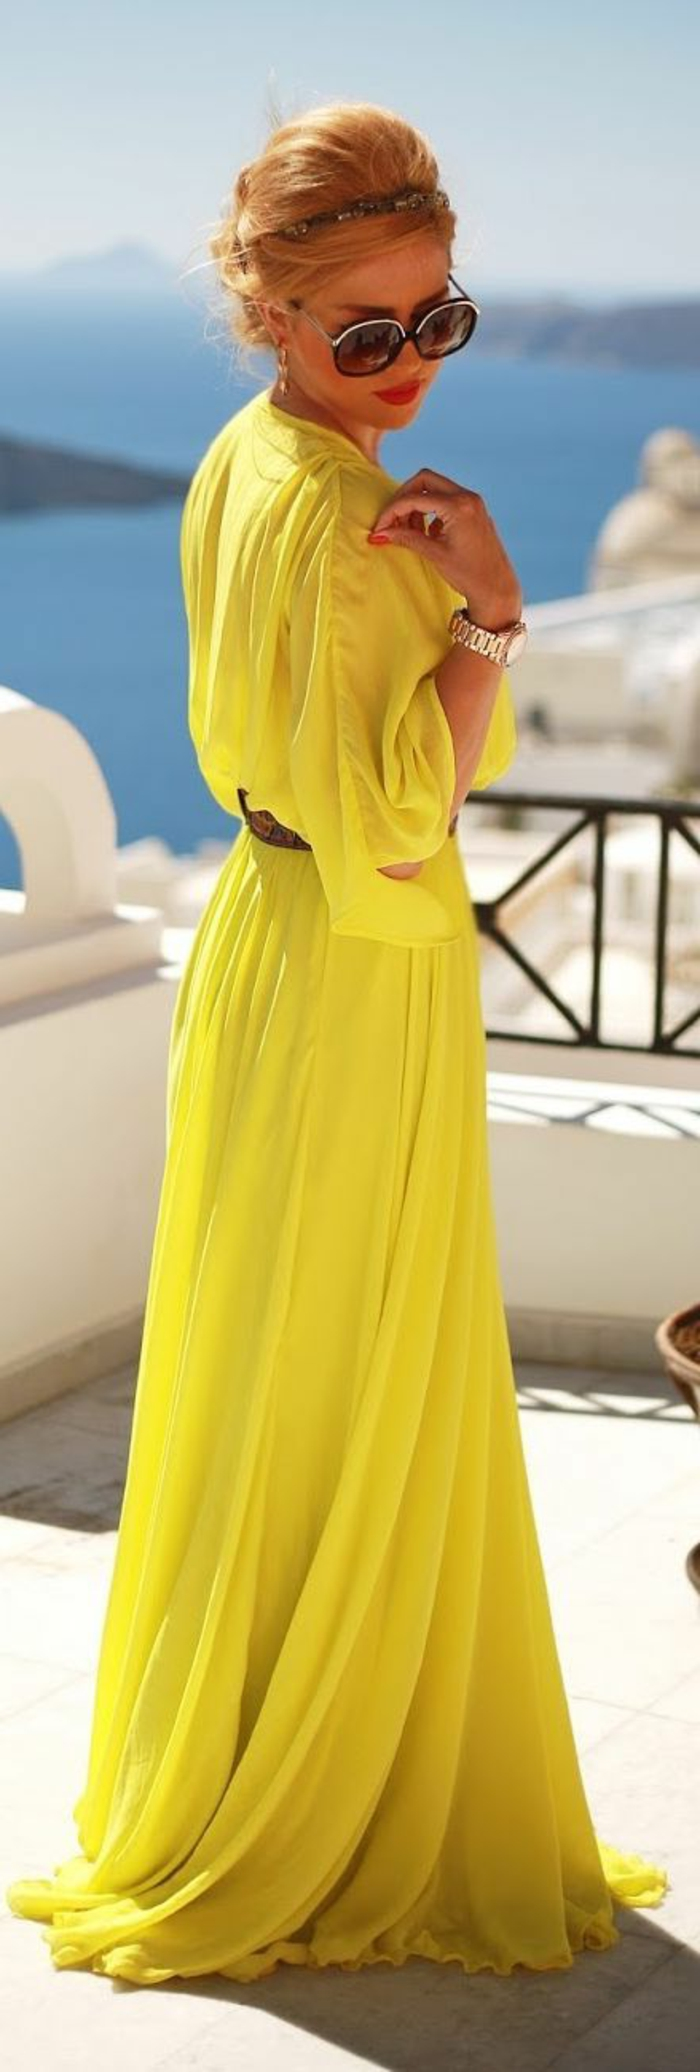 kleid gelb lang frauen modetrends lifestyle